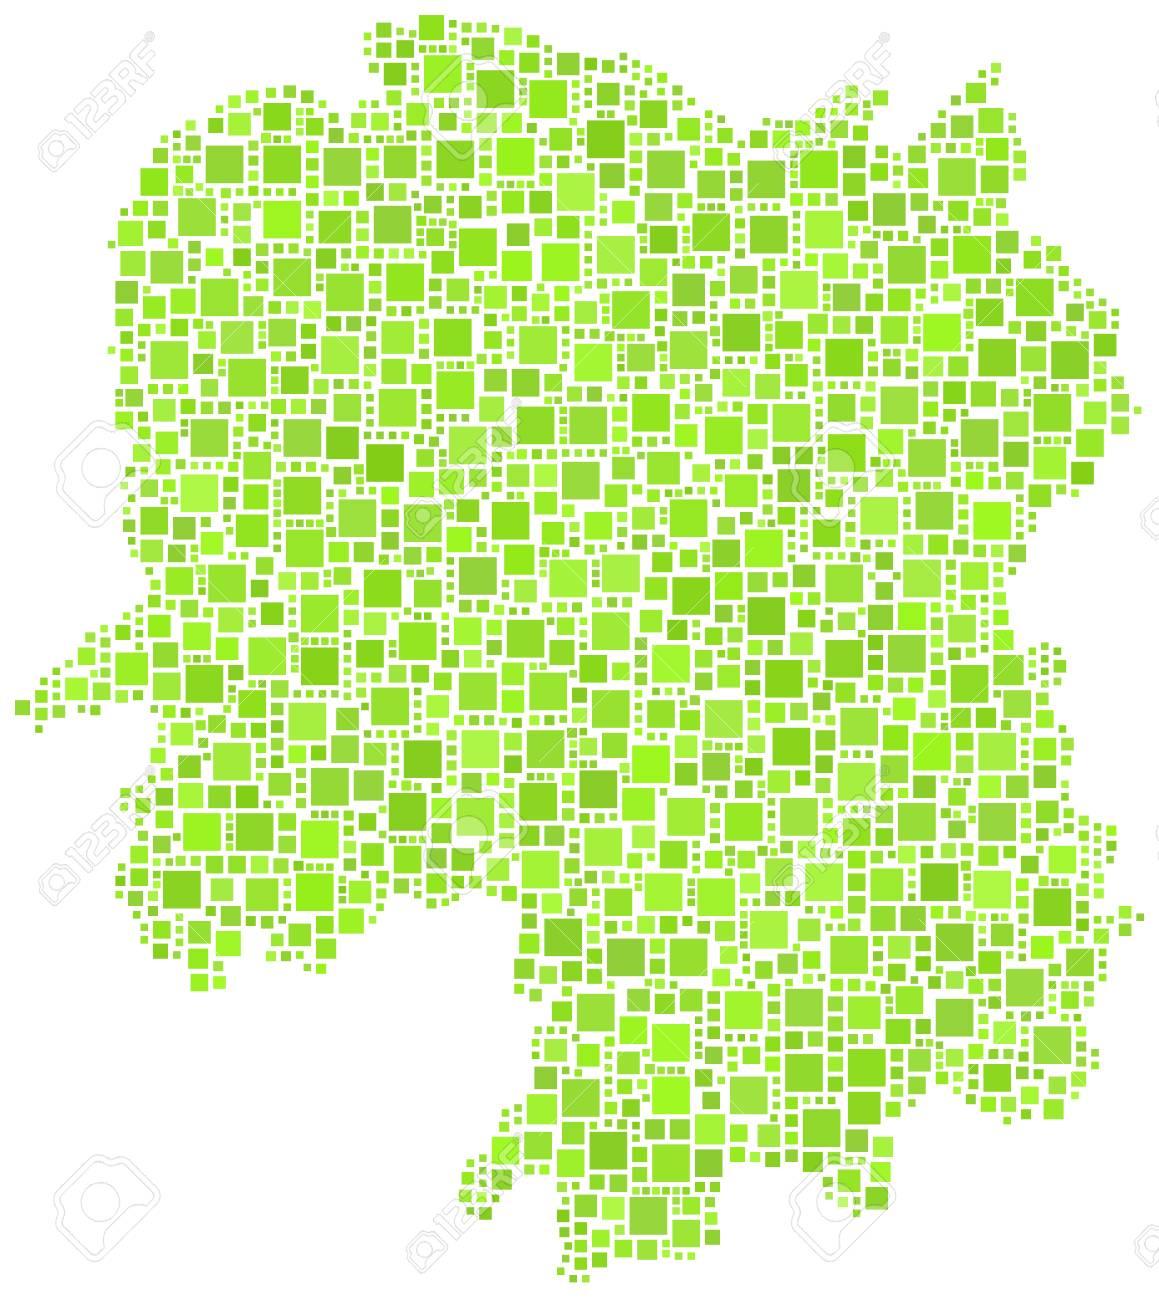 Hunan Province China Map.Decorative Map Of Hunan Province Of China In A Mosaic Of Green